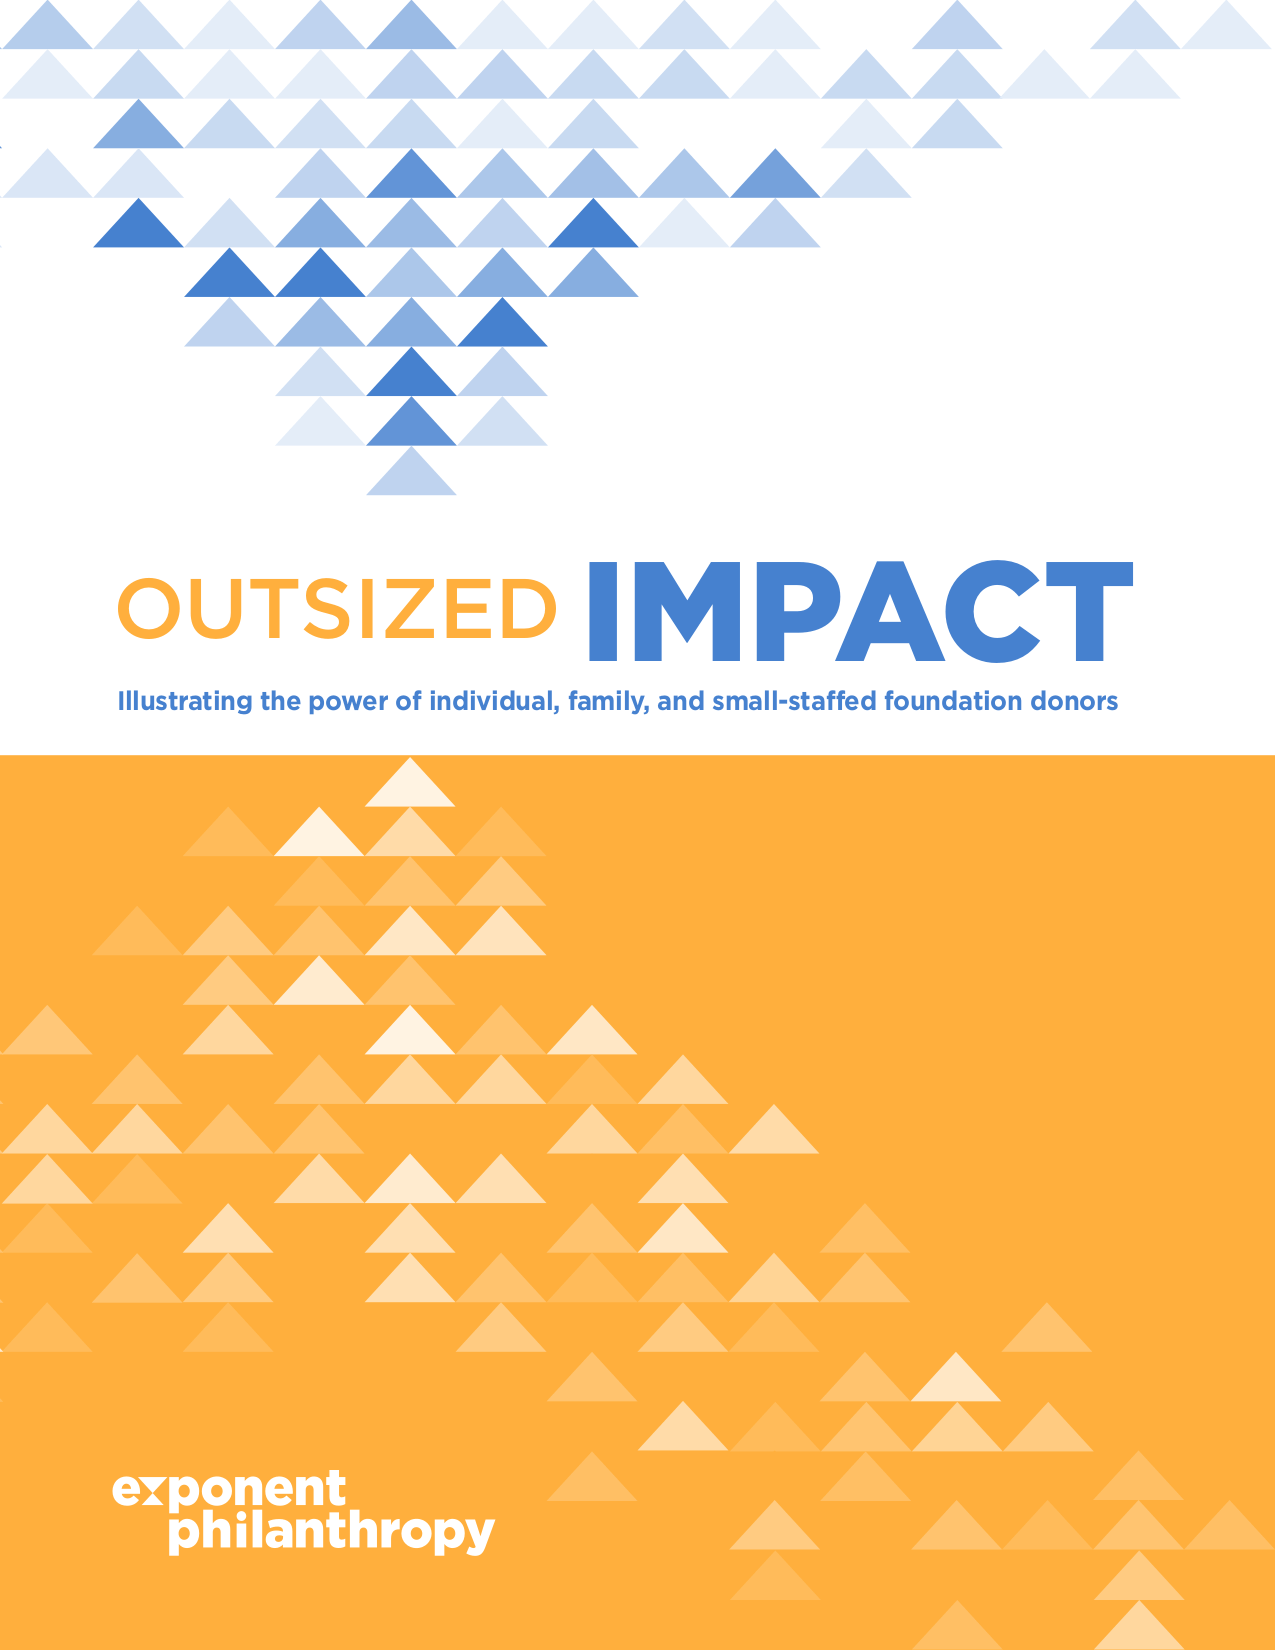 Outsized Impact 2015